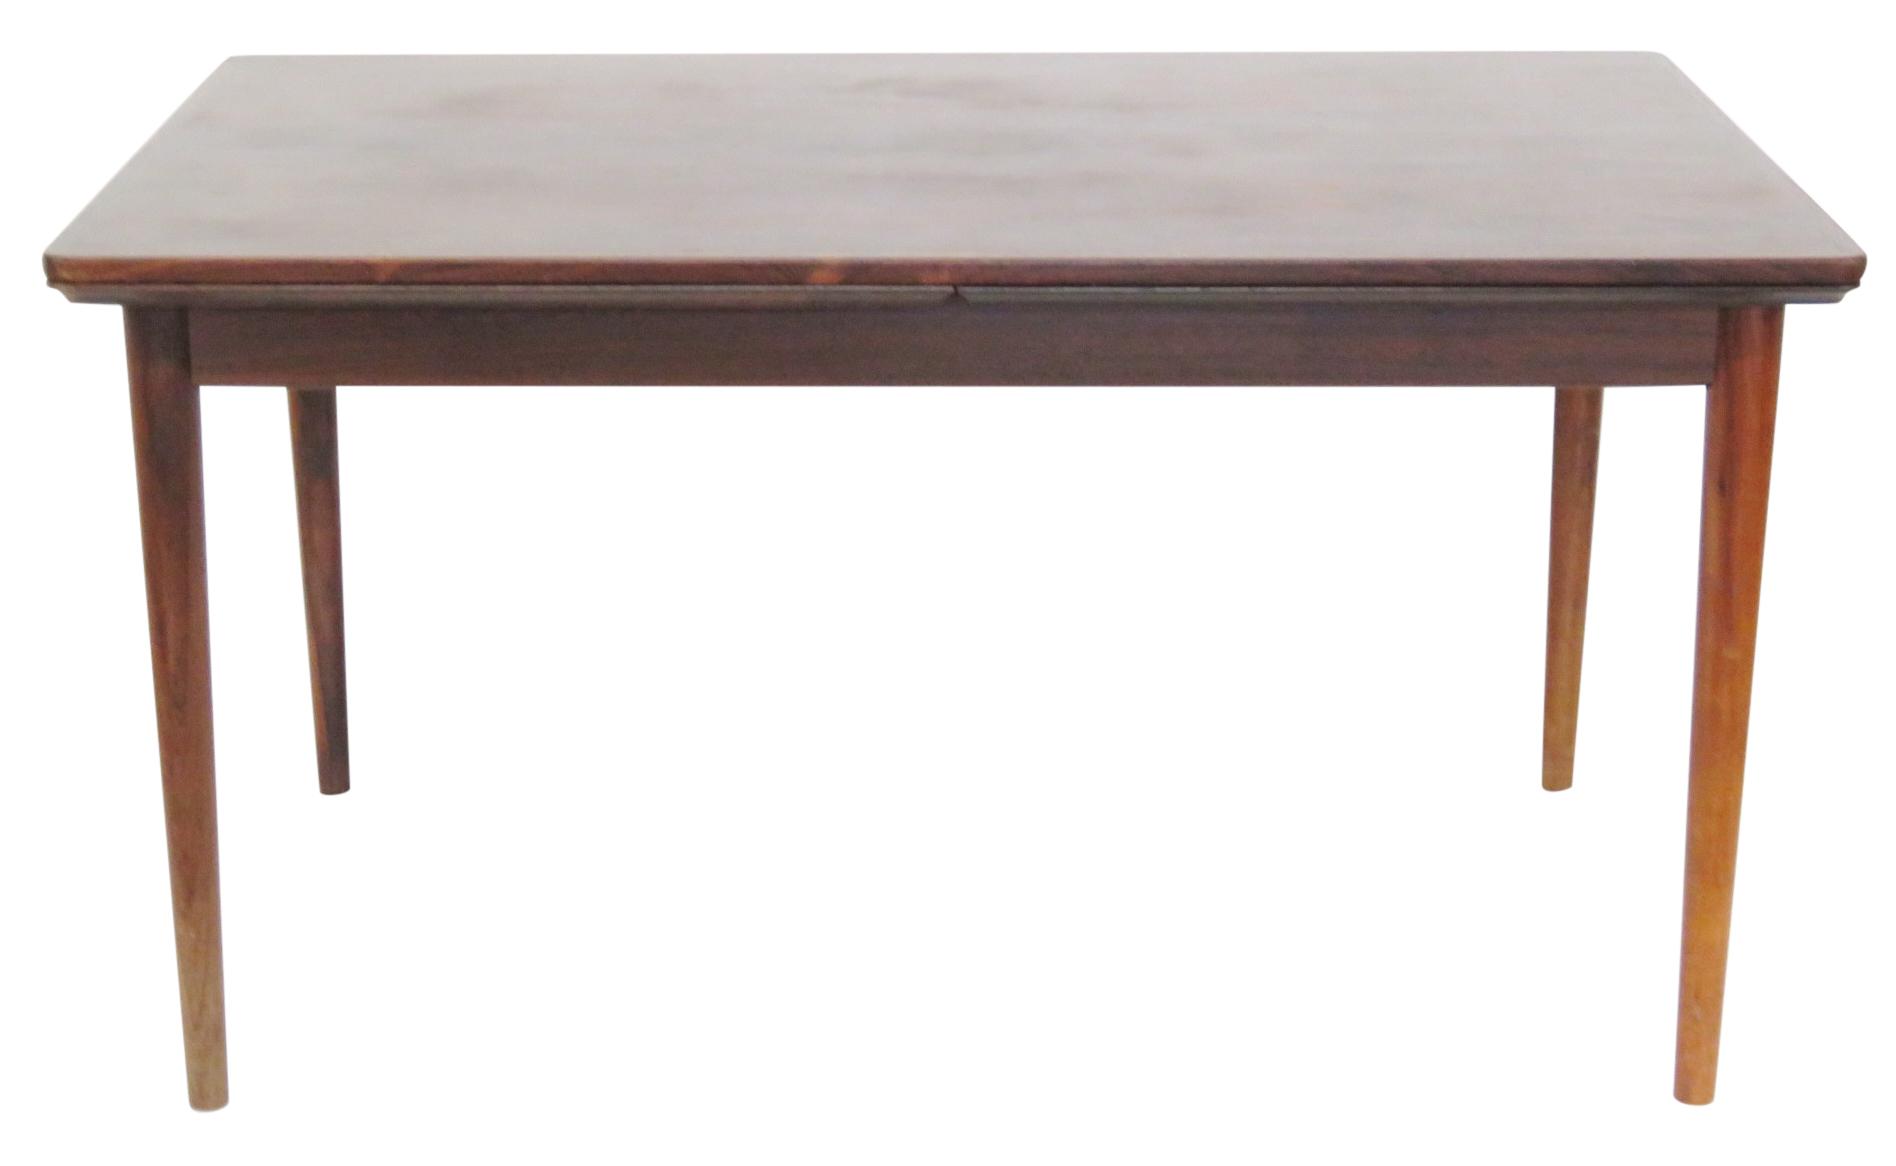 Danish Modern Rosewood Dining Table Chairish : b2476b7b 7b52 44f5 96b8 3f816c3b0ce1aspectfitampwidth640ampheight640 from www.chairish.com size 640 x 640 jpeg 16kB